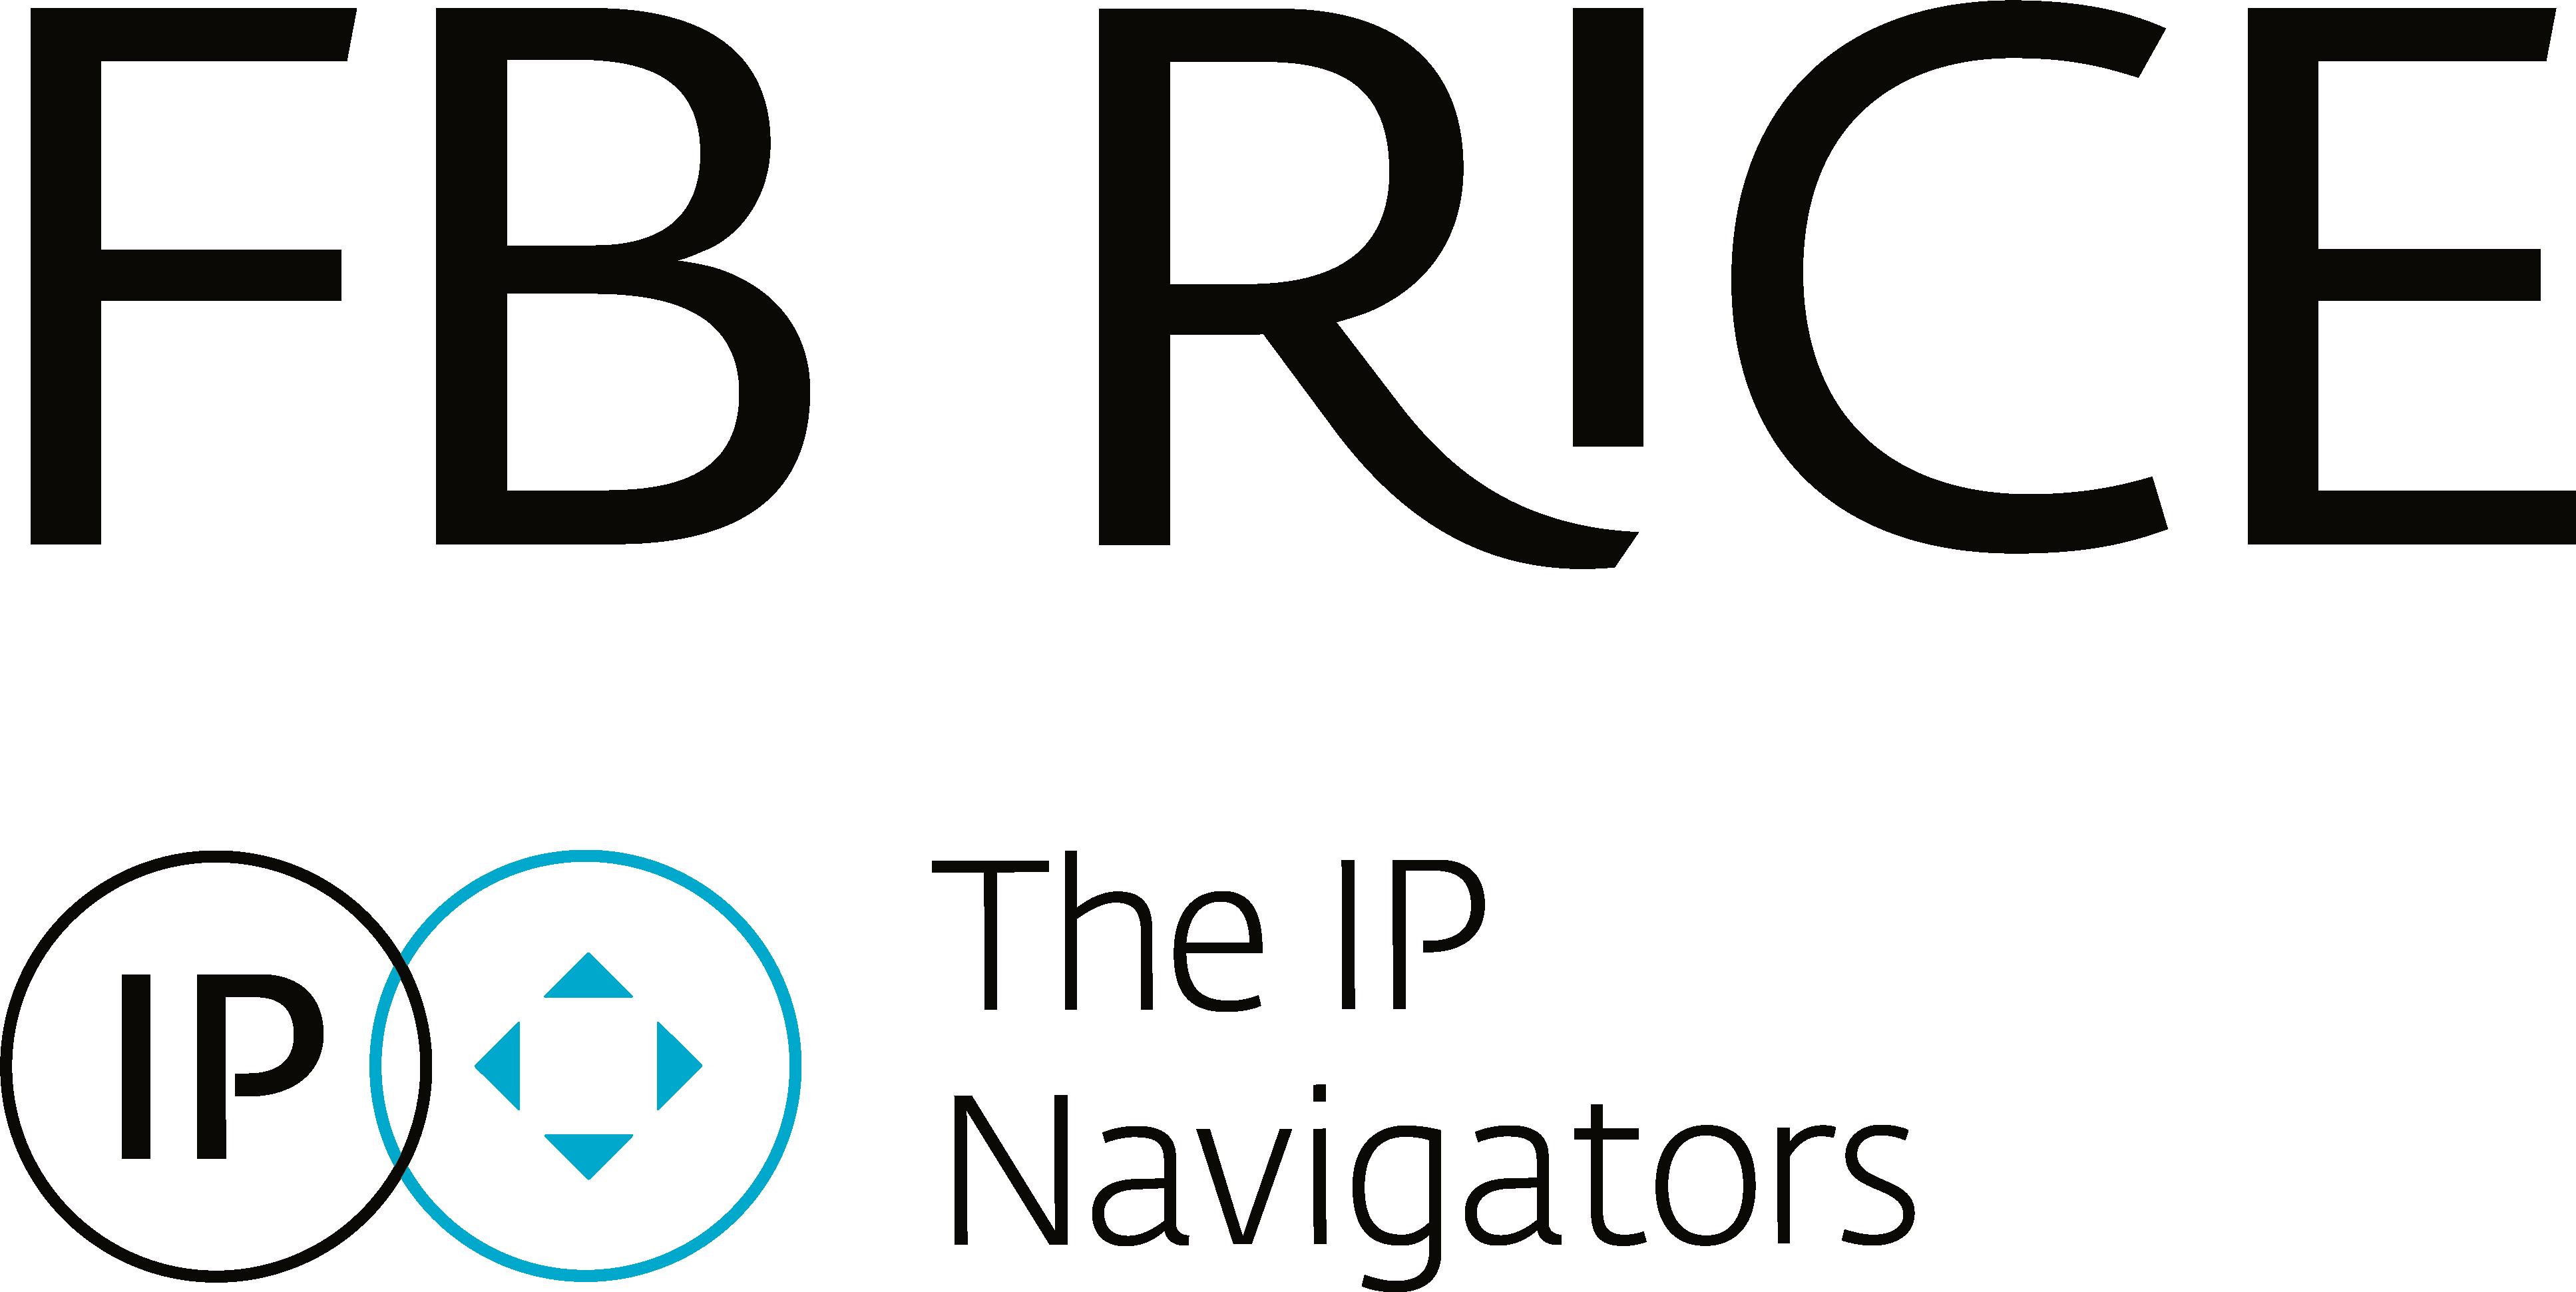 FBR_Logo+Symbol_stacked_2PMS